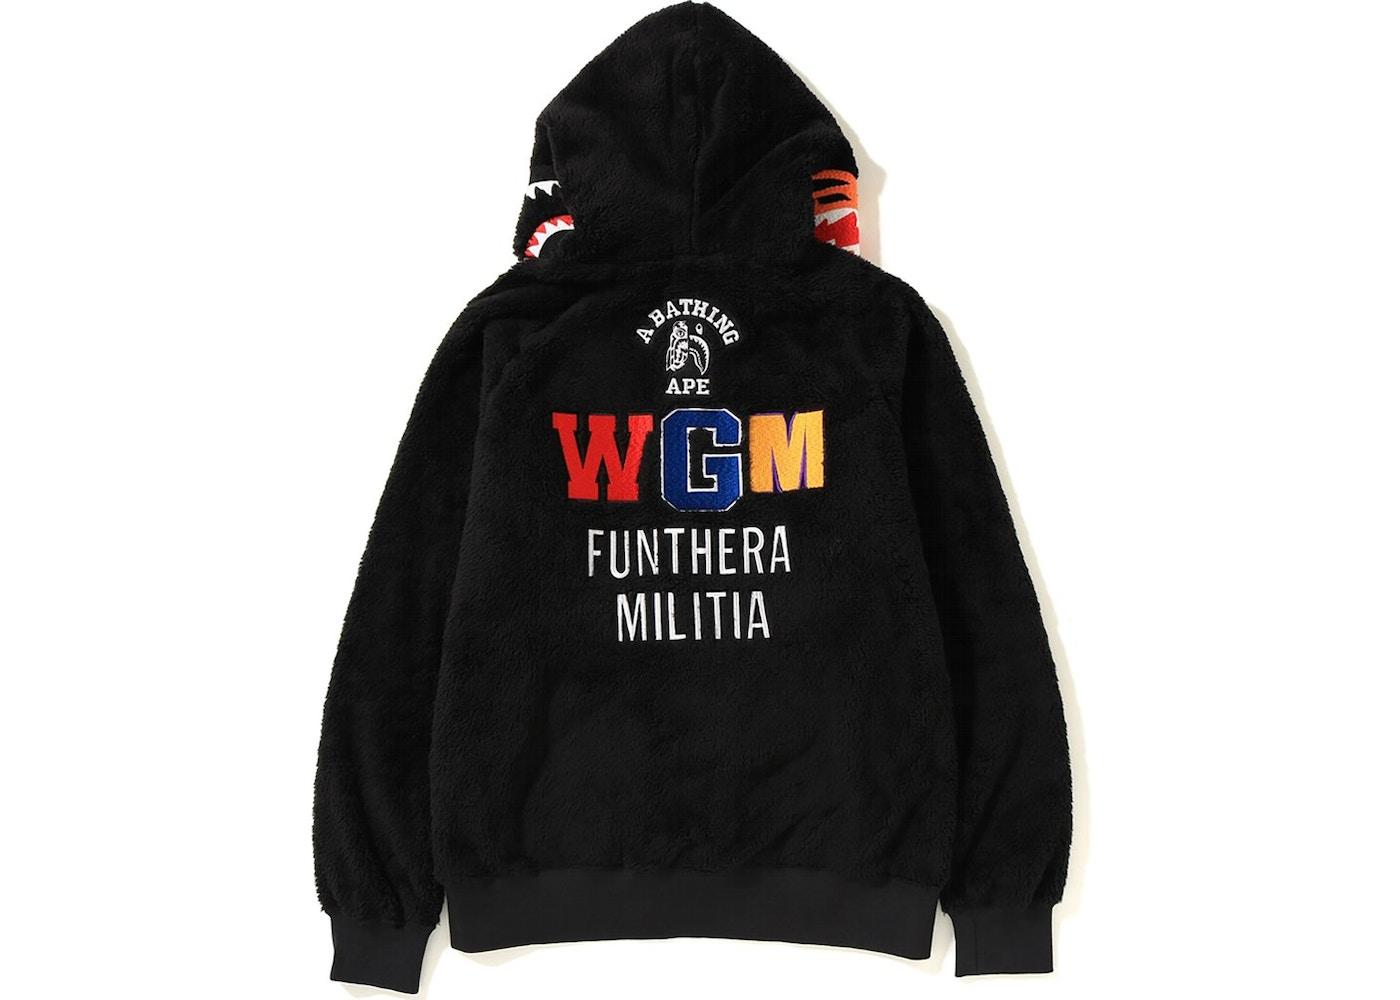 9ef708b54e5c Streetwear - Bape Jackets - New Highest Bids